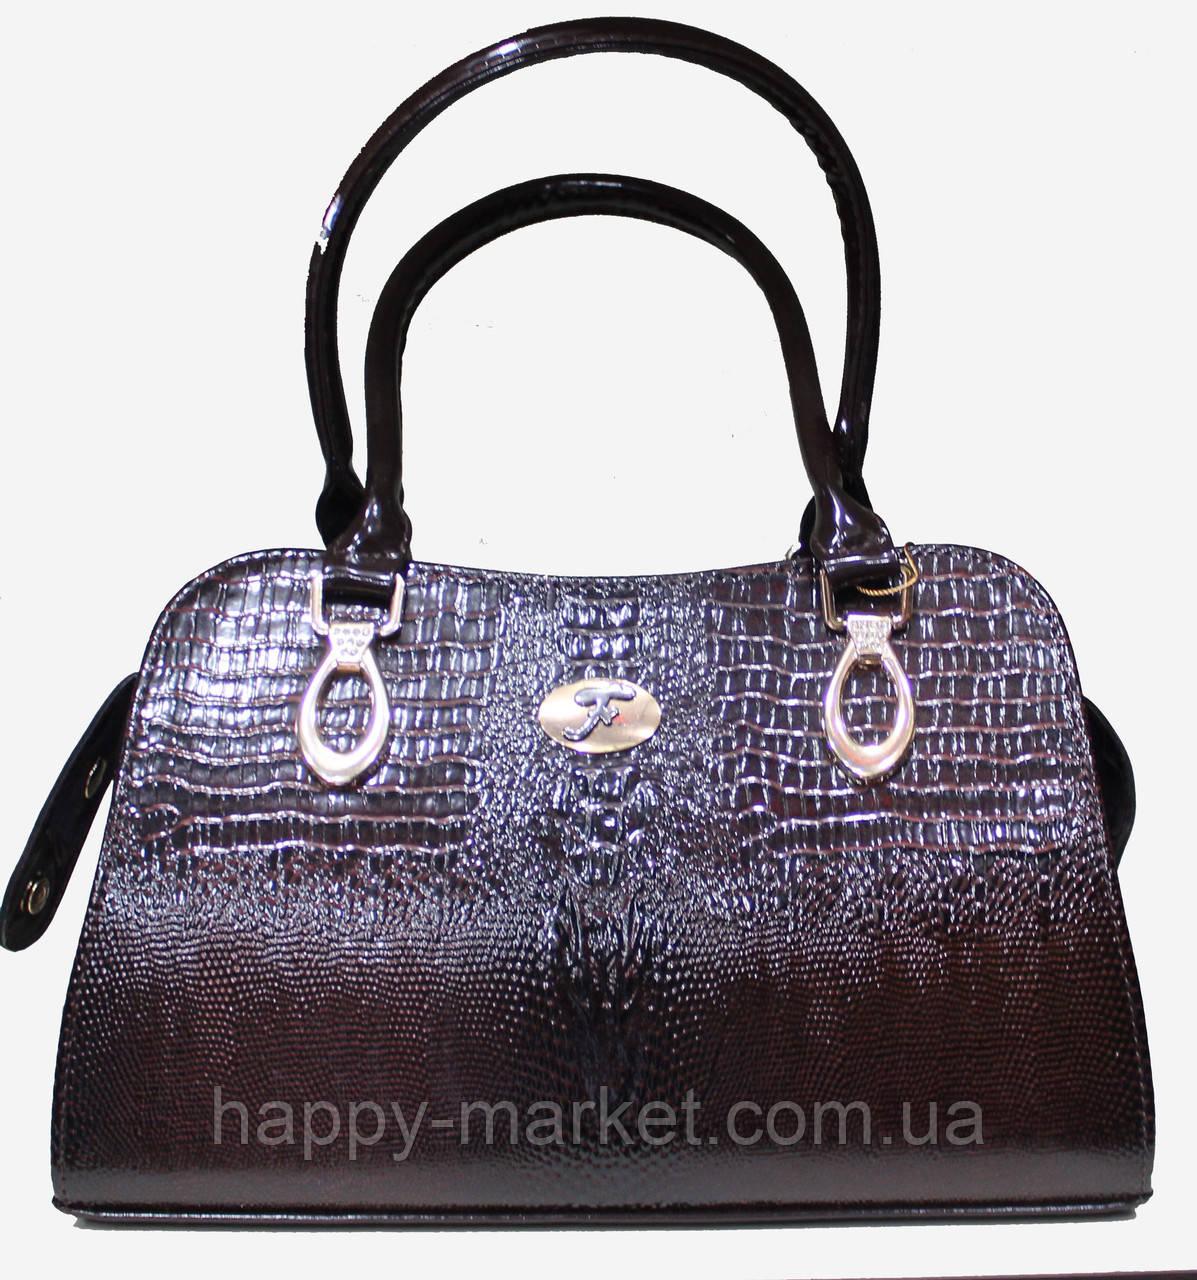 Сумка женская классическая каркасная LUCK SHERRYS 17-2115-10 -  Интернет-магазин Хеппи e16641e44f7